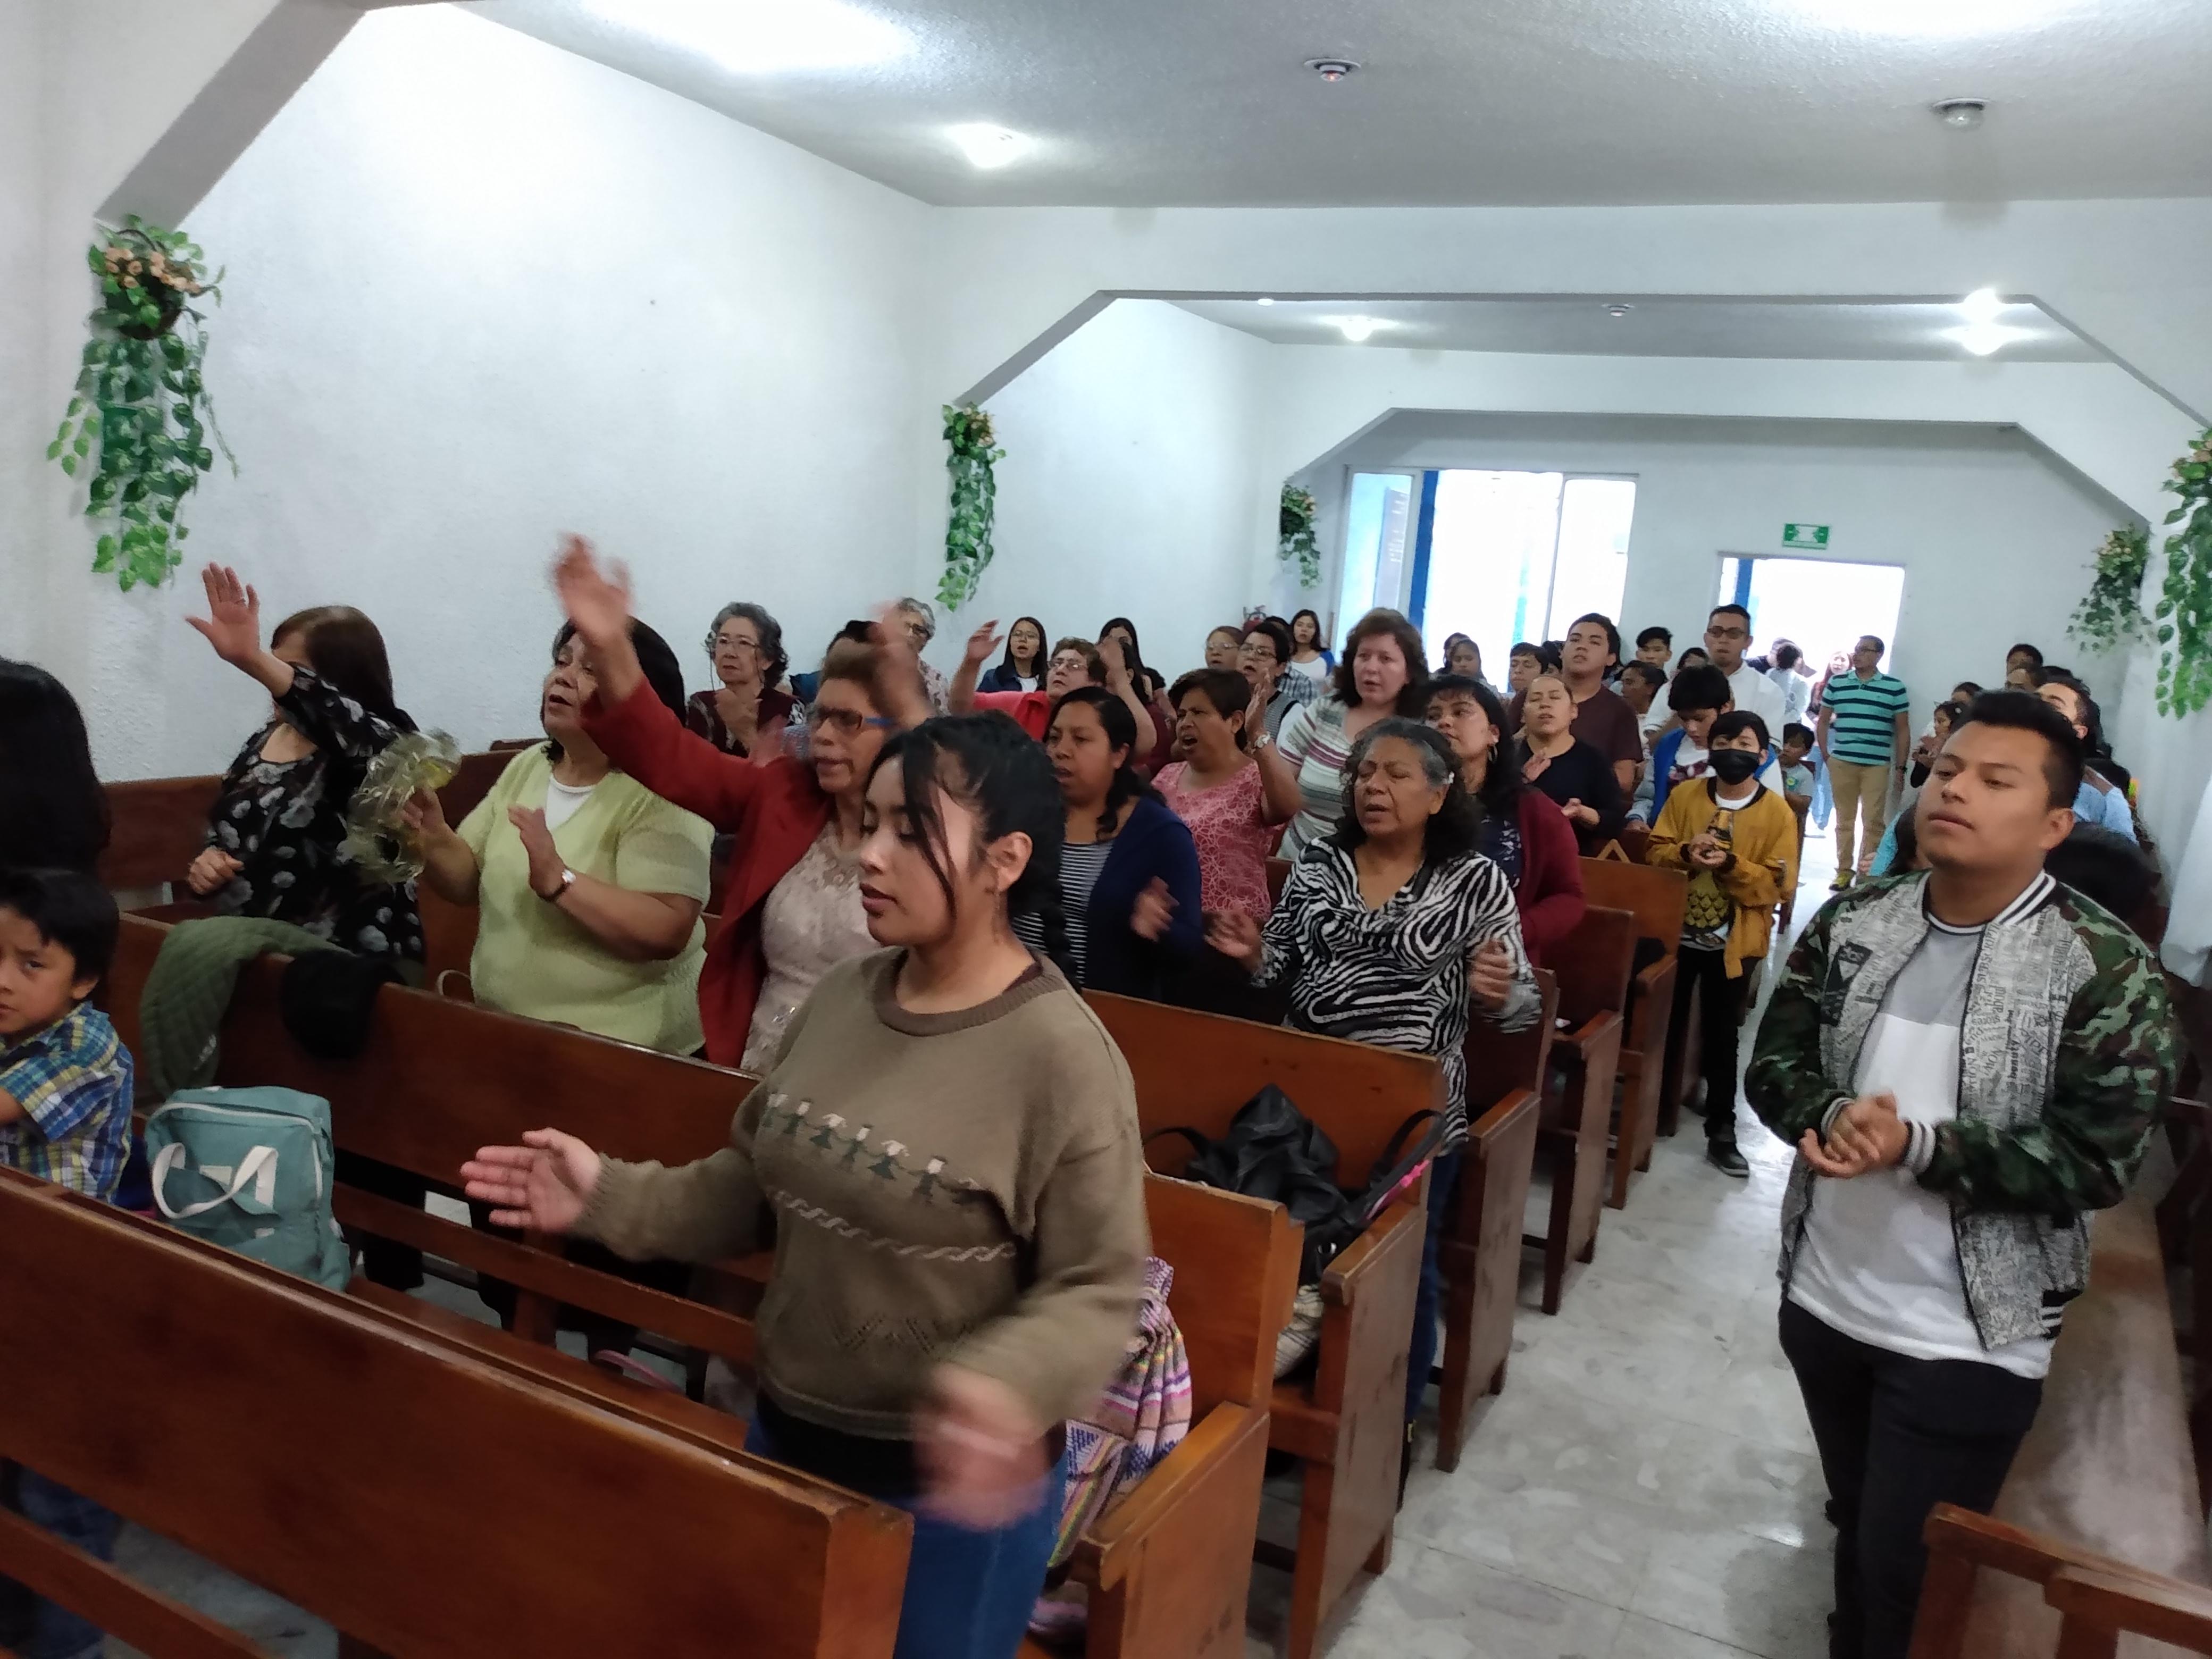 mexico_cindy_moraga-selva_IMG_20200314_175818123.jpg